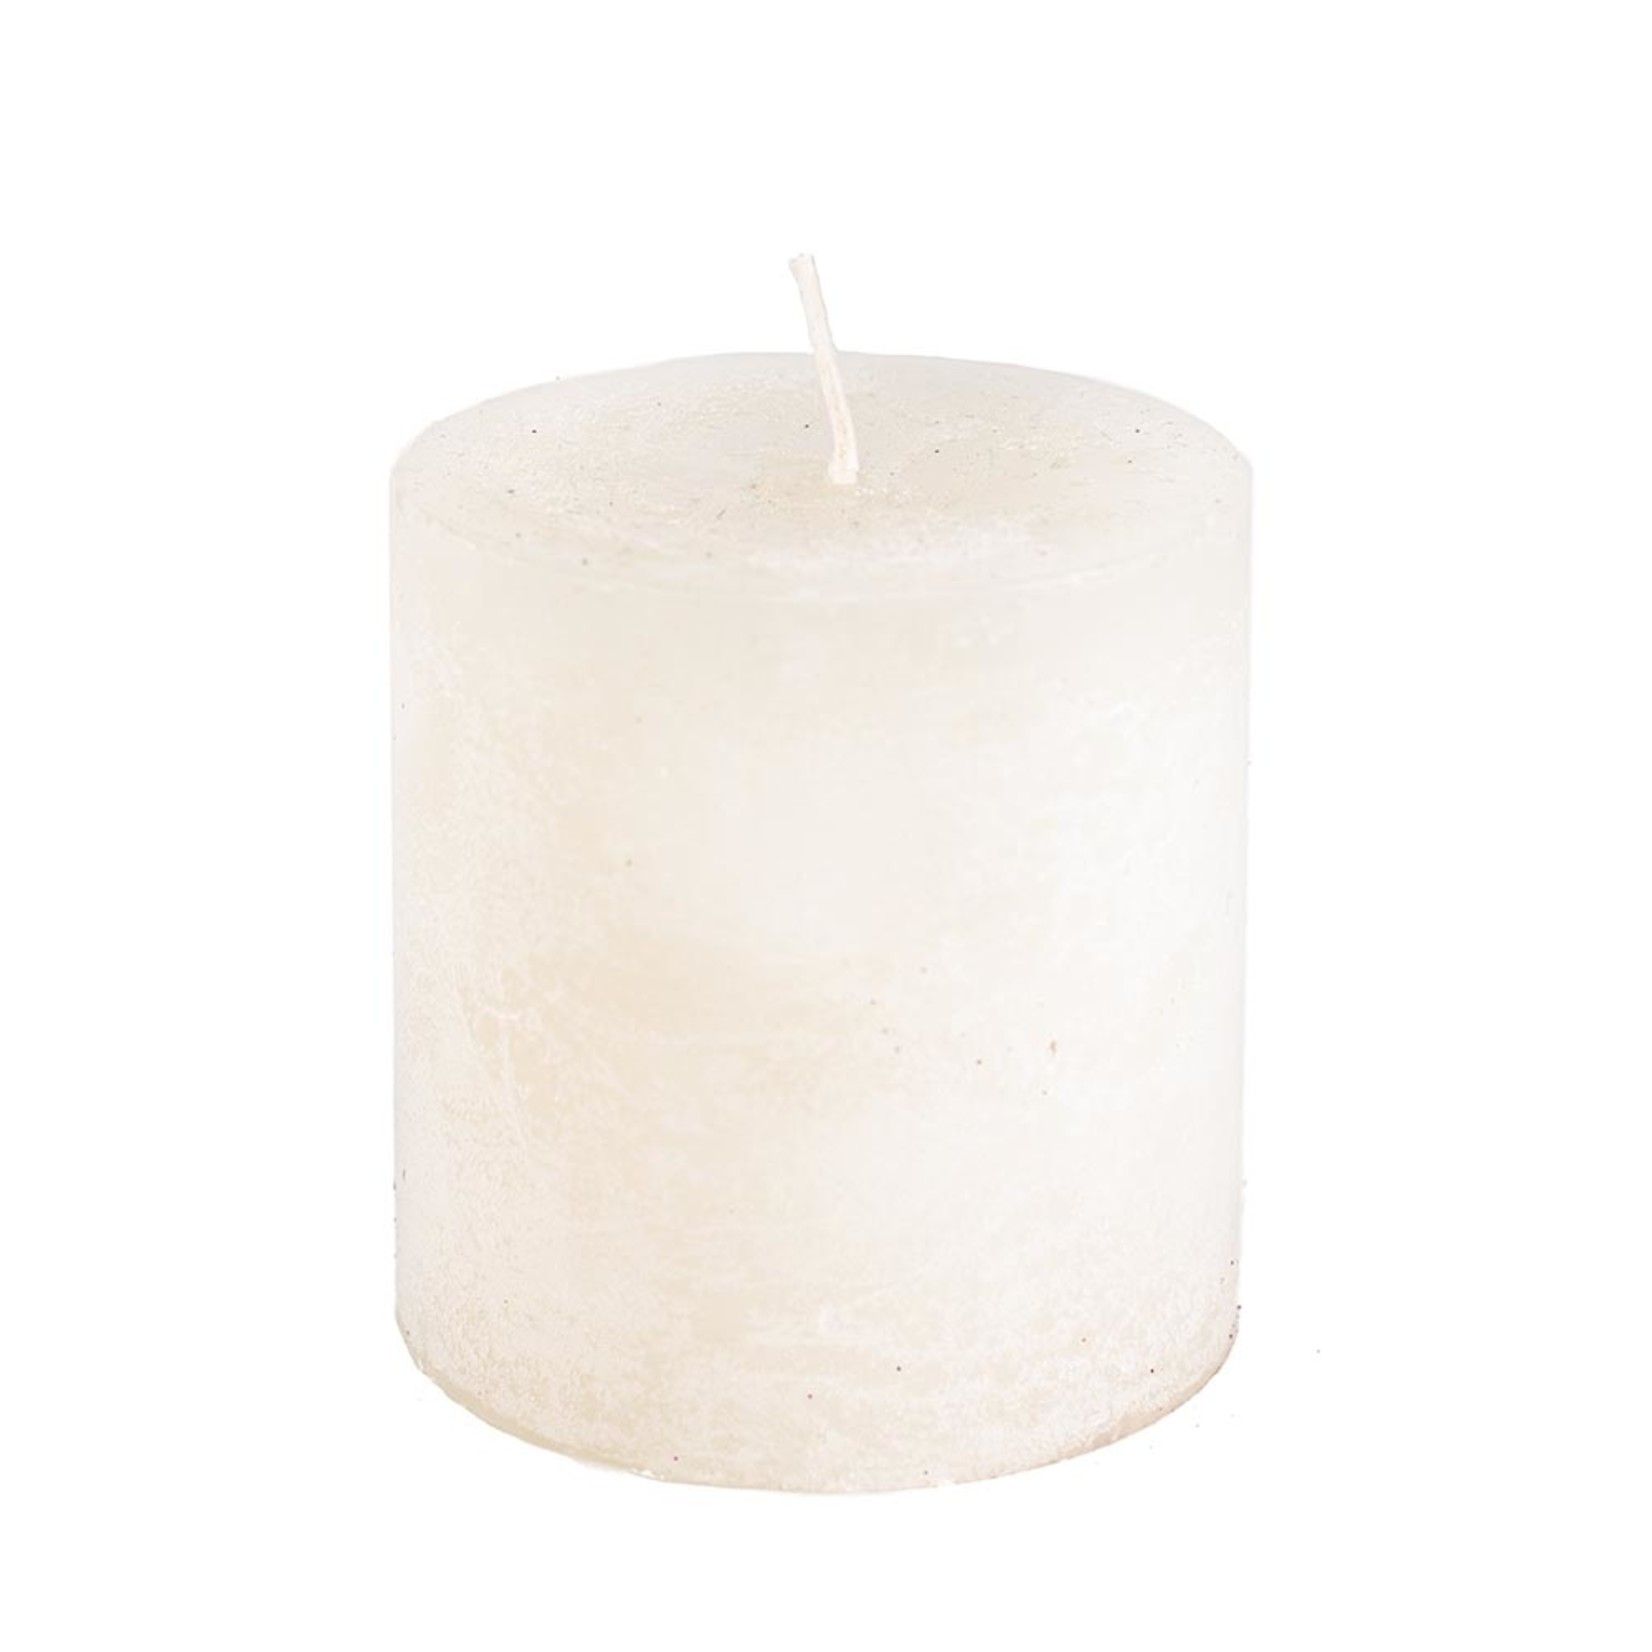 Home Society Pillar Candle 9x10cm Cream